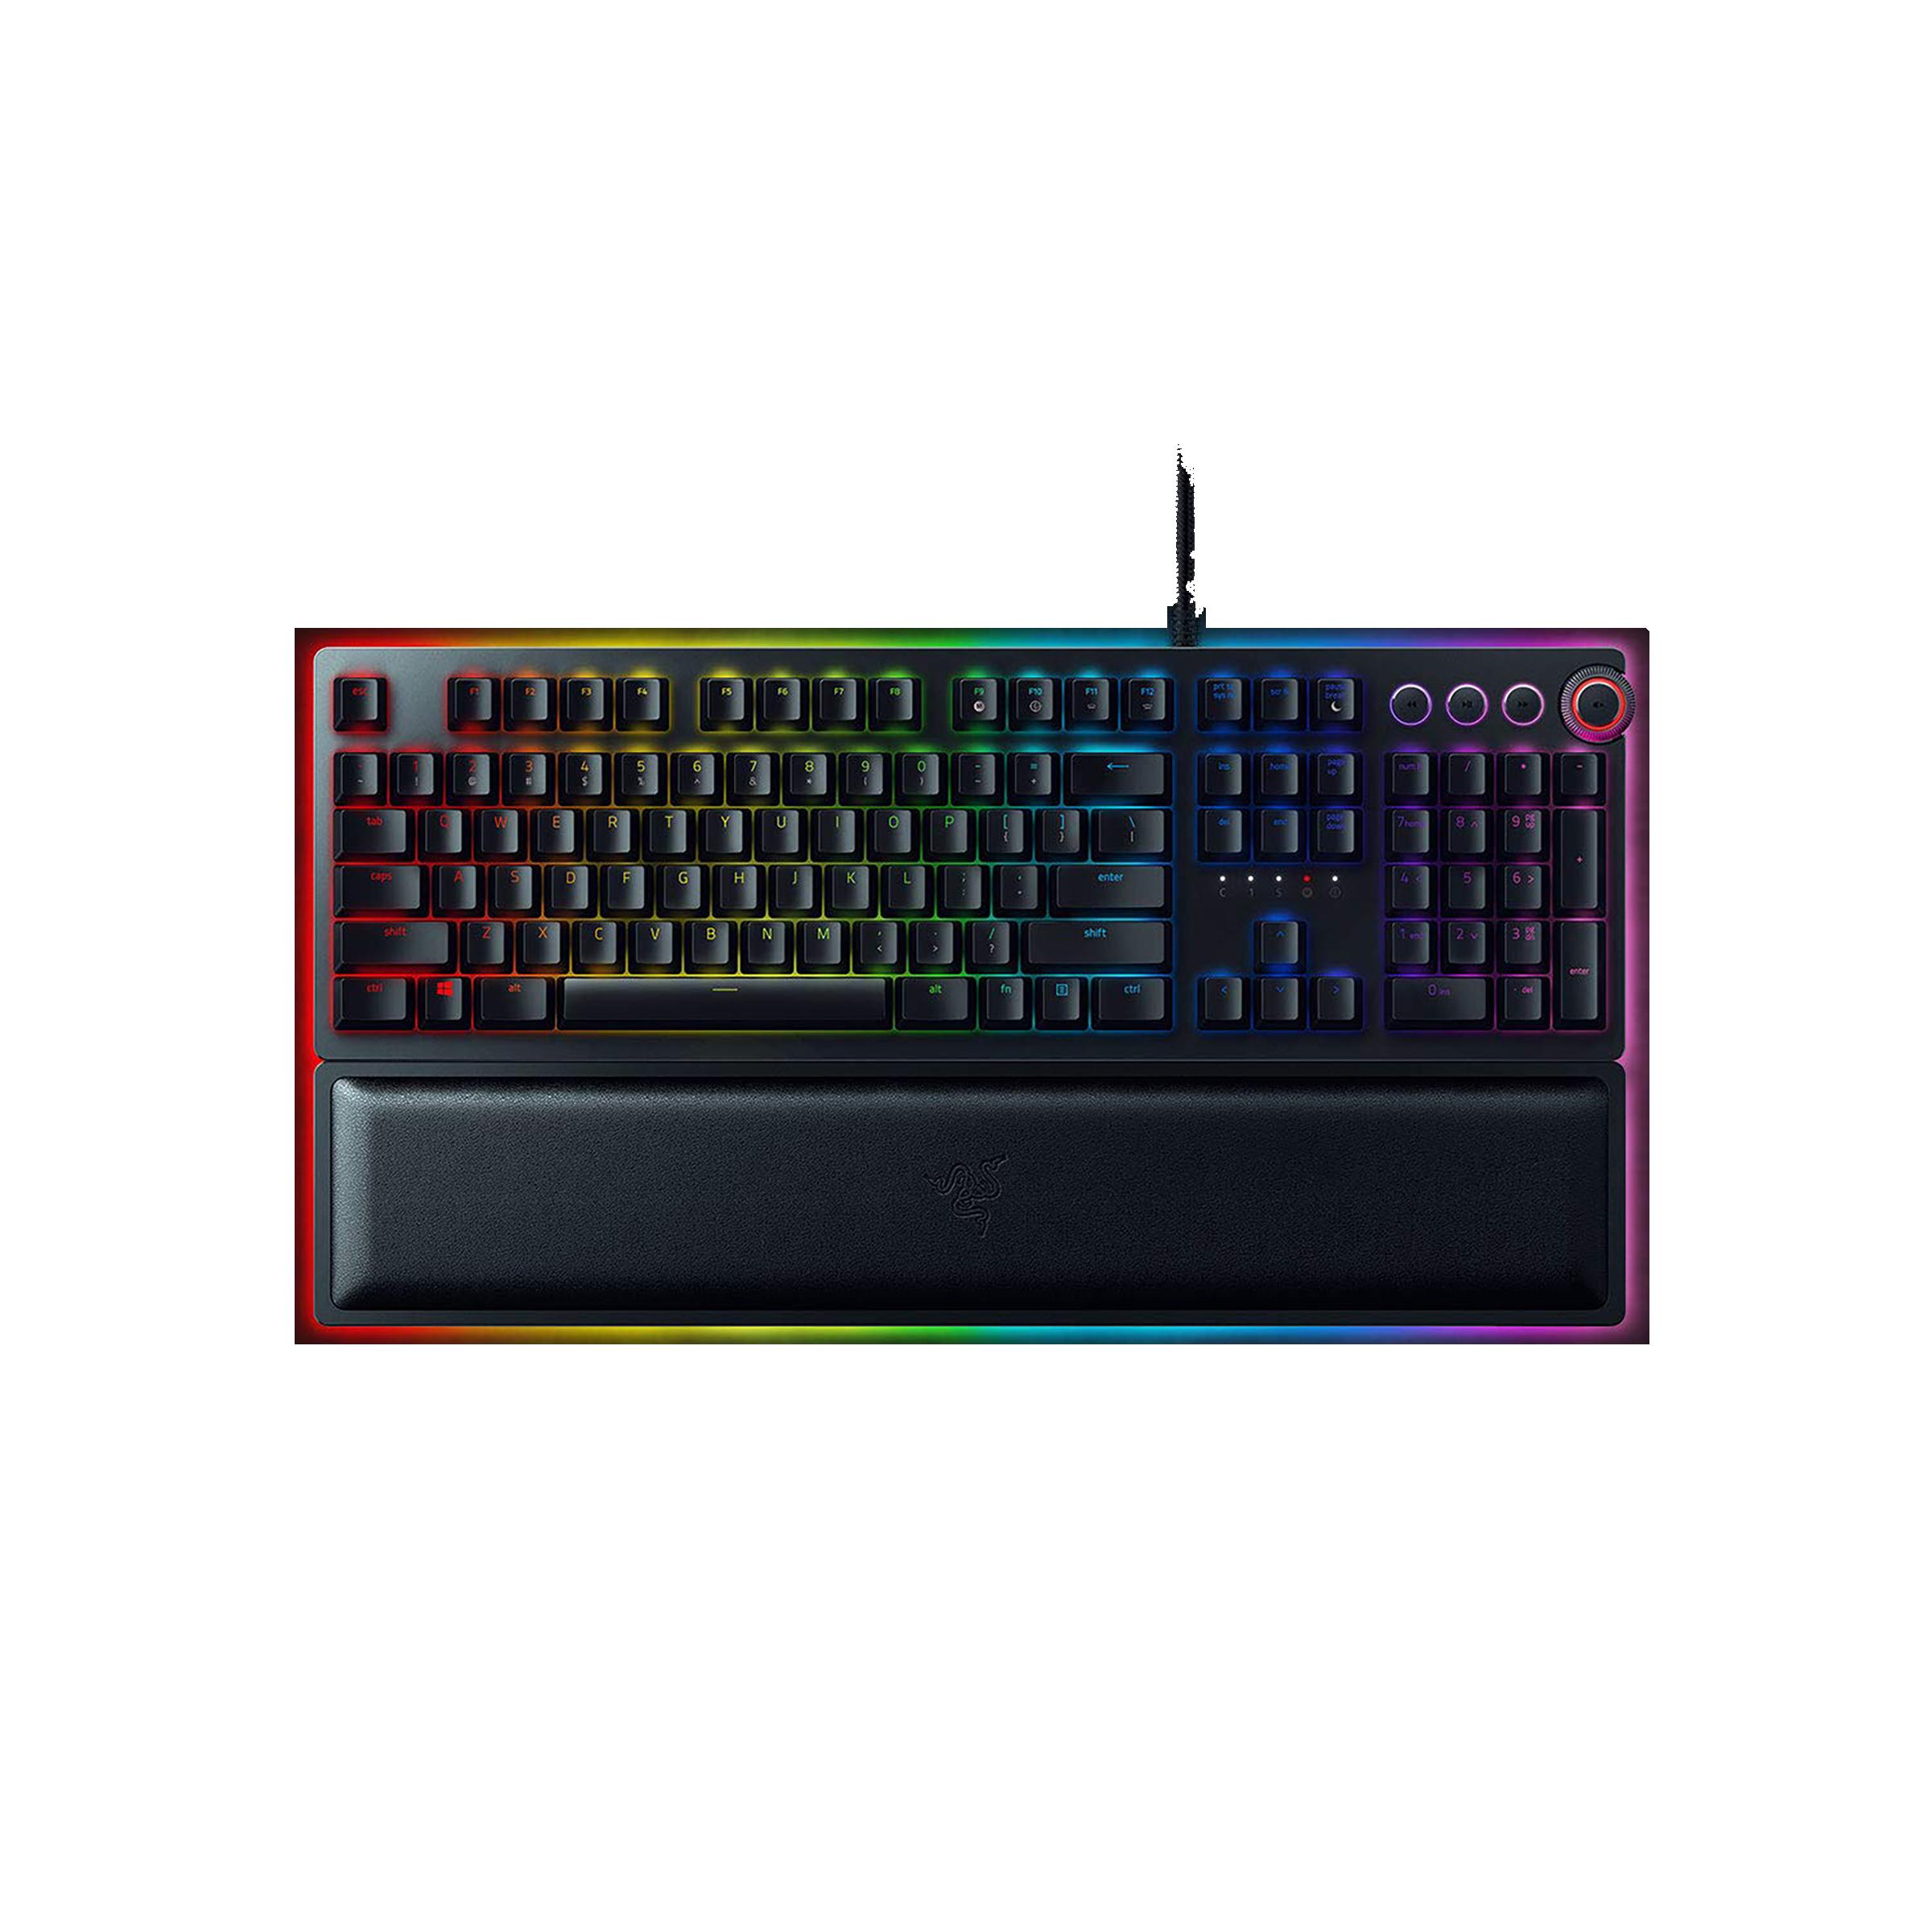 Razer Huntsman Elite Wired Gaming Keyboard (Opto-Mechanical Switch, RZ03-01870100-R3M1, Black)_1